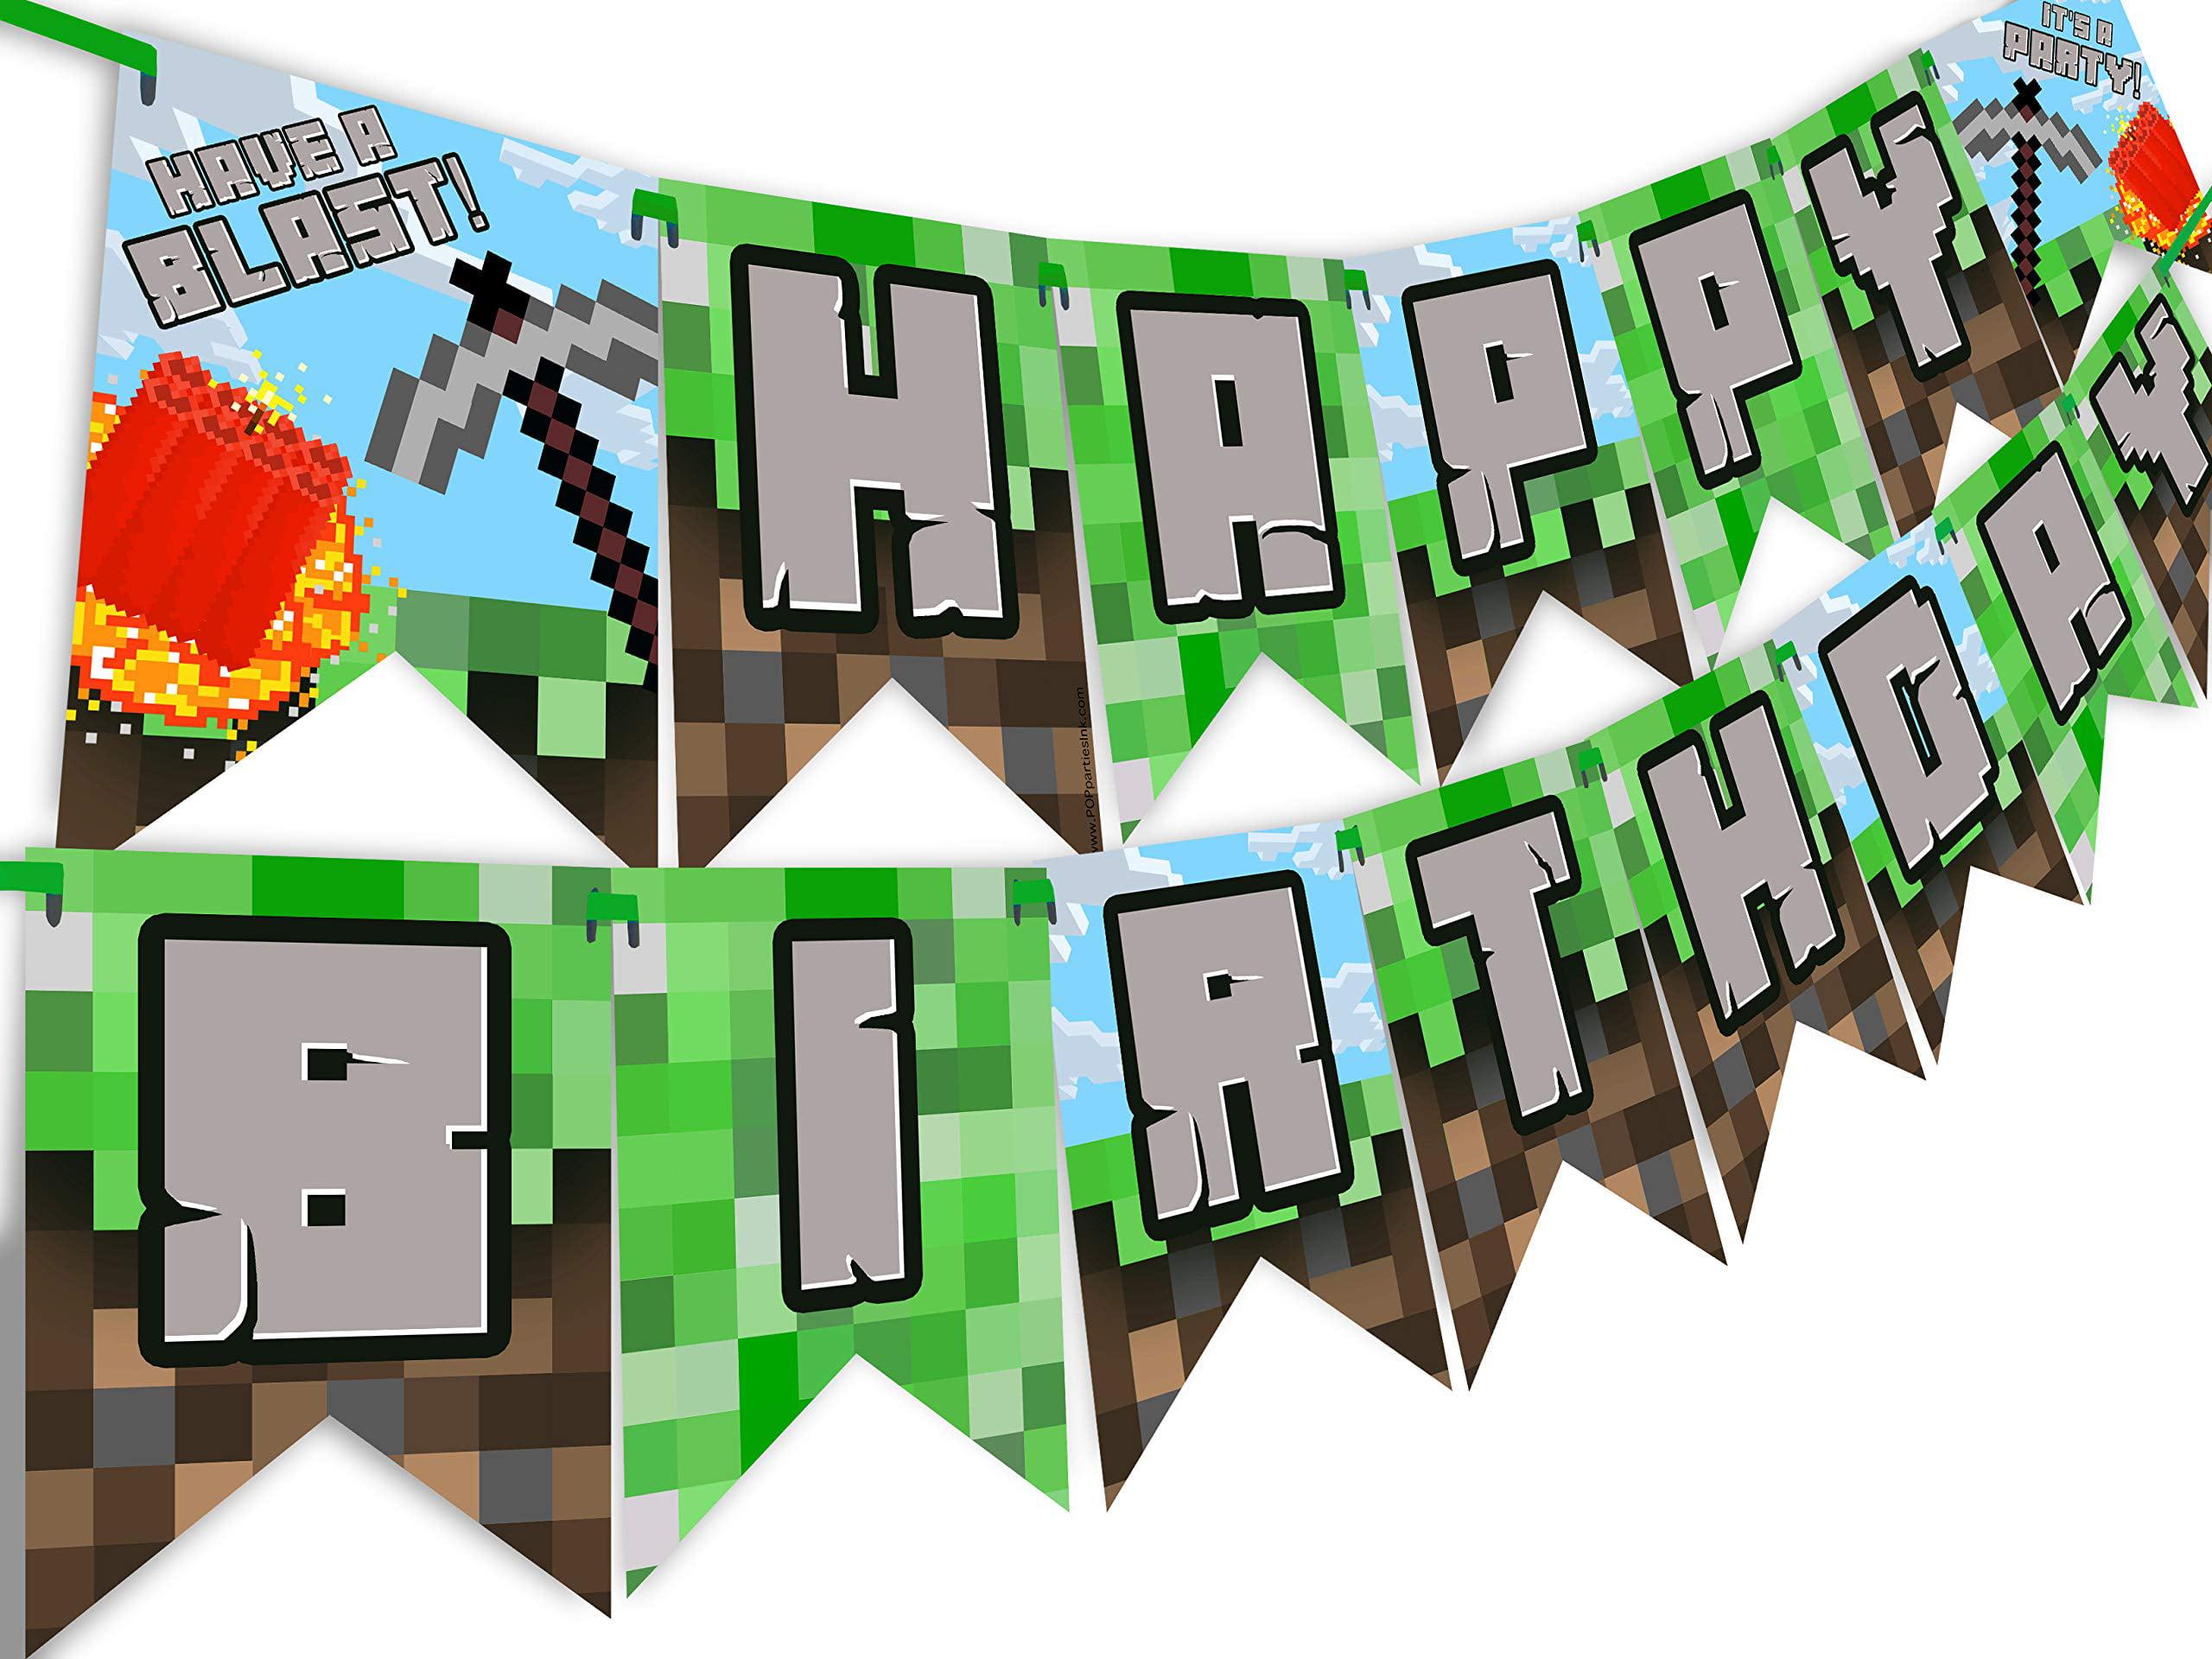 Pixel Party Happy Birthday Banner - Made in the USA - Blast - Walmart.com - Walmart.com